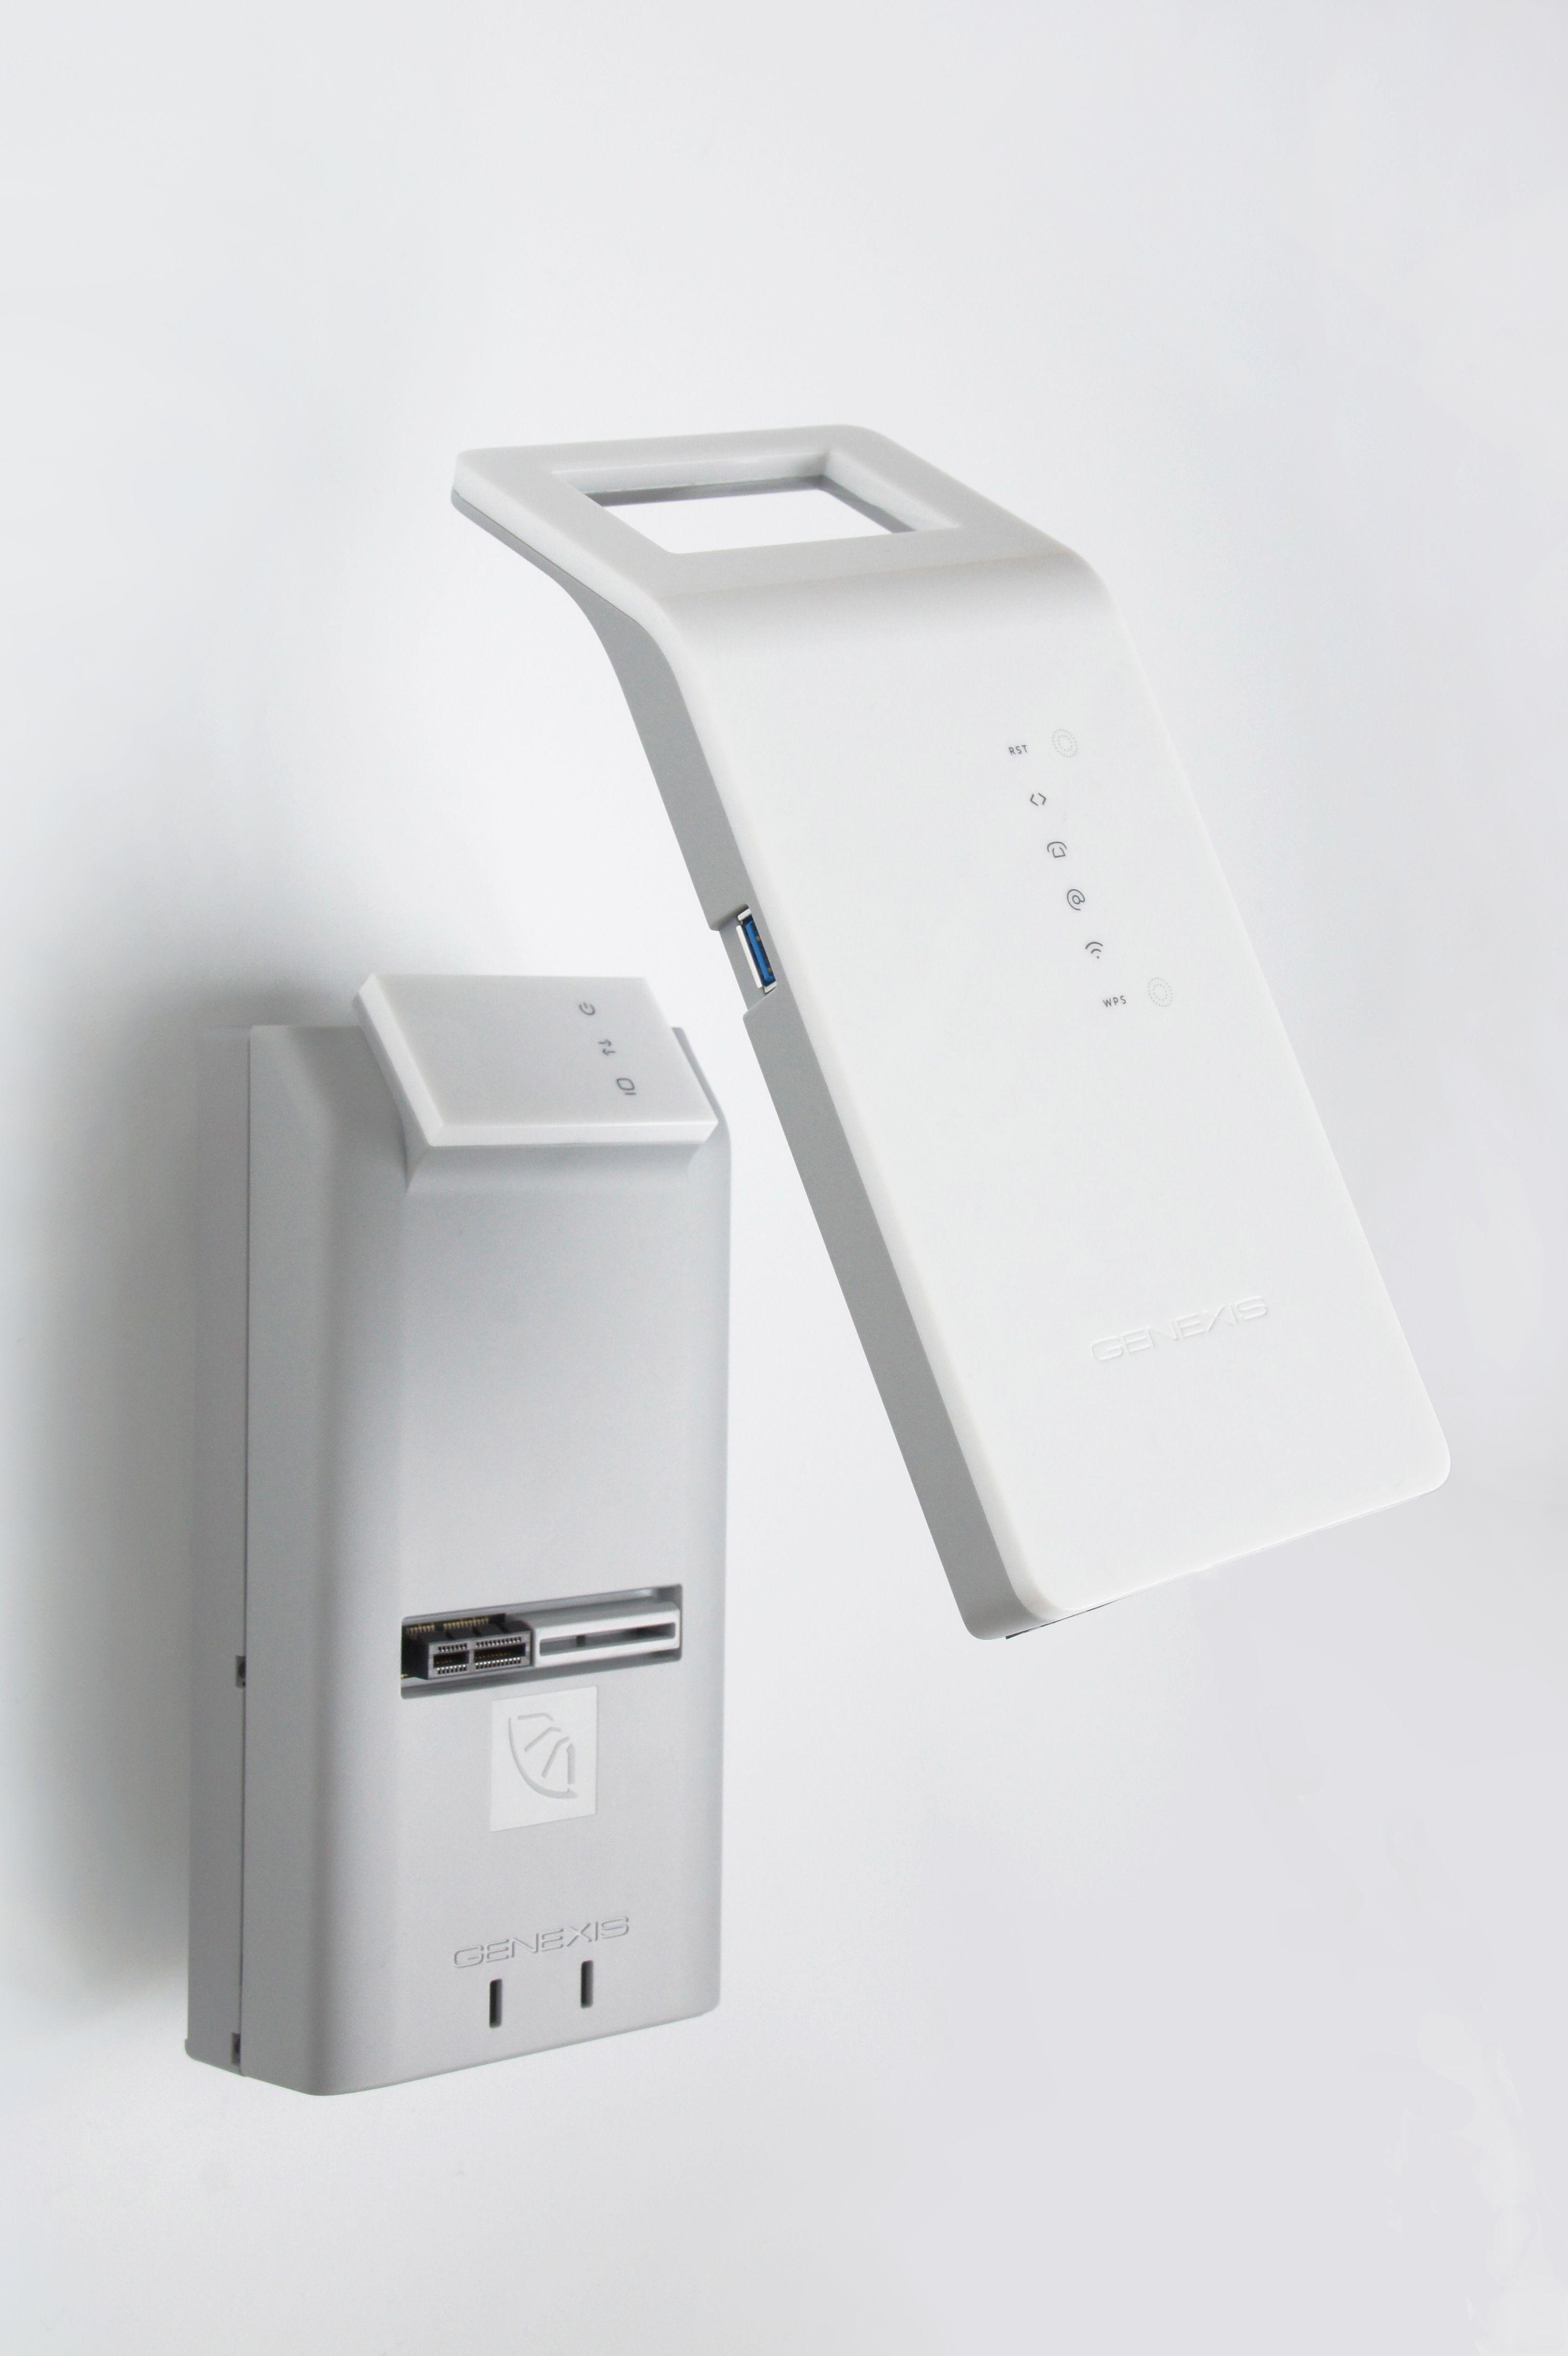 genexis fiber modem